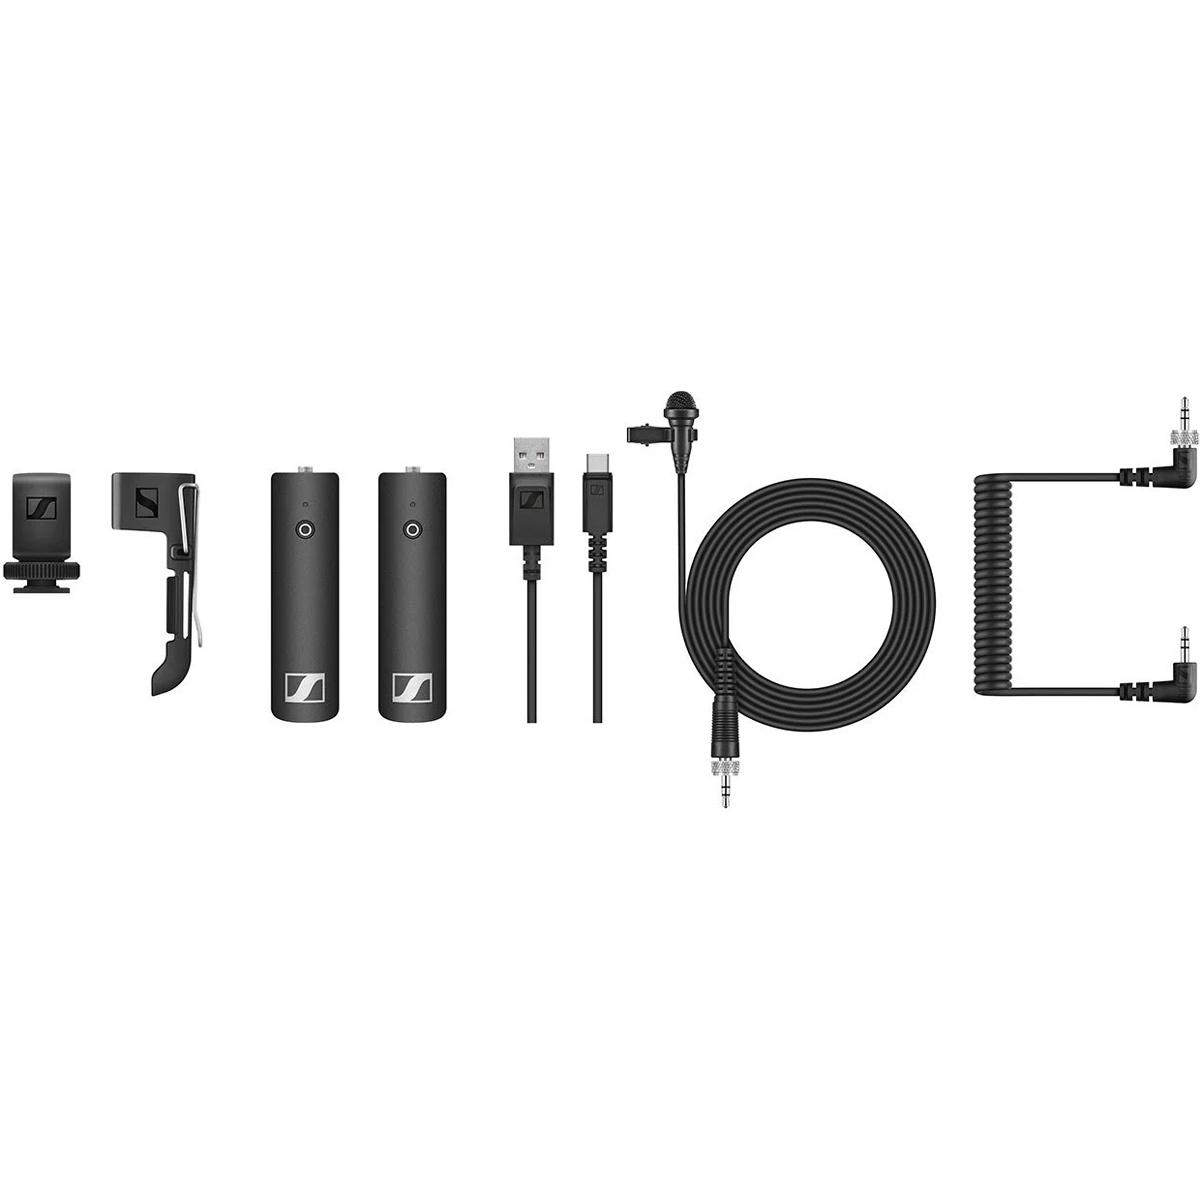 Sennheiser XSW-D Drahtloses Lavaliermikrofon Set